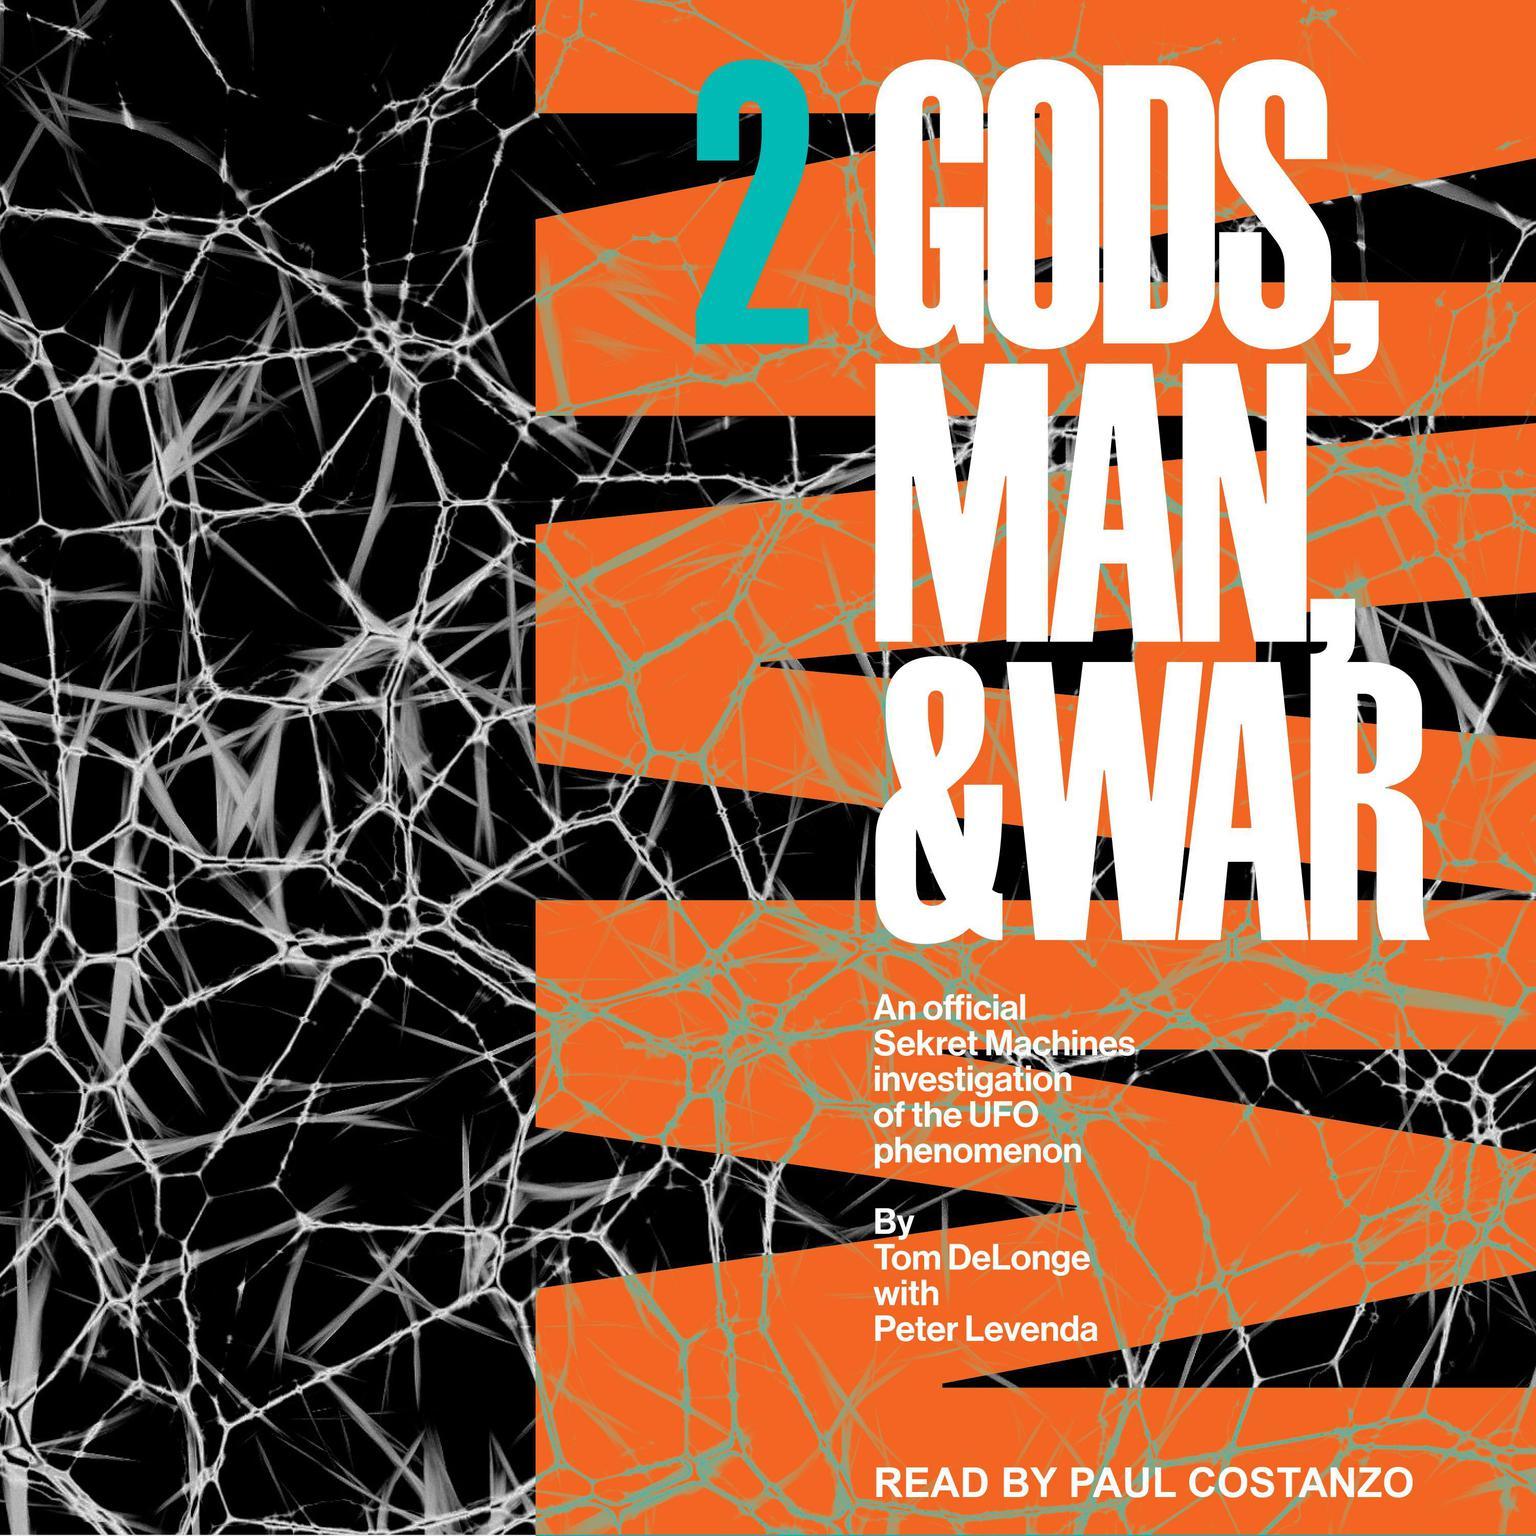 Sekret Machines: Man: Gods, Man & War, Book 2 Audiobook, by Tom DeLonge